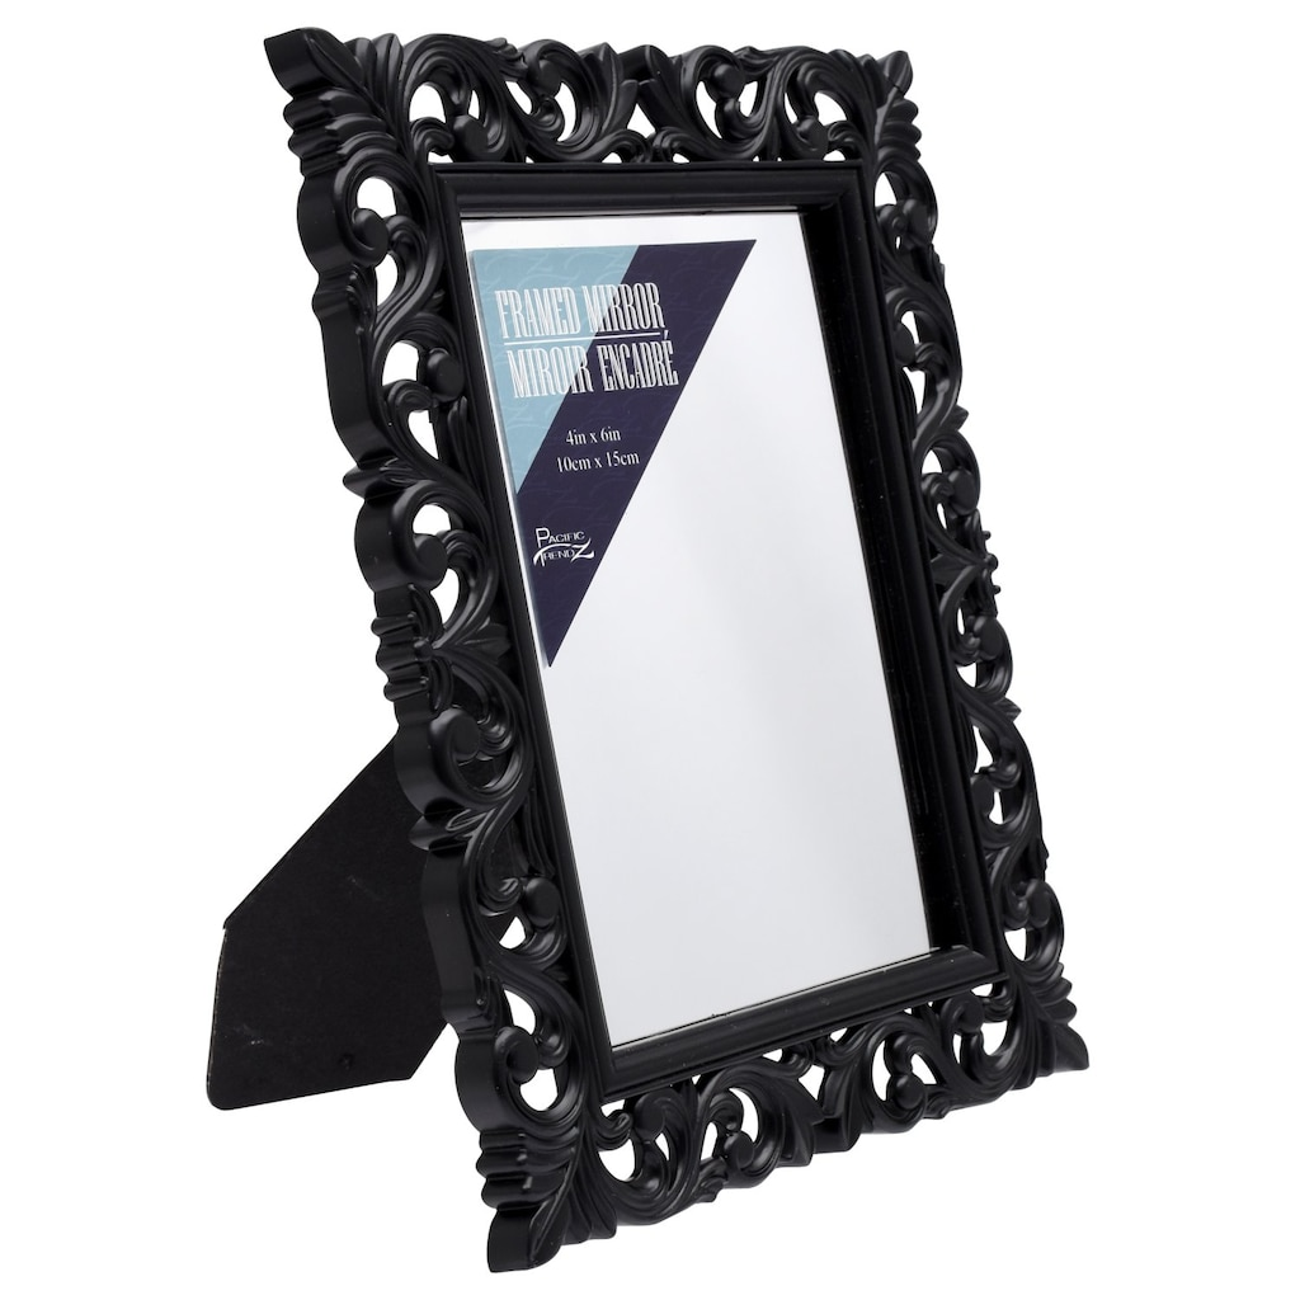 c2eadb9e5bf Ornate Black Framed Mirrors